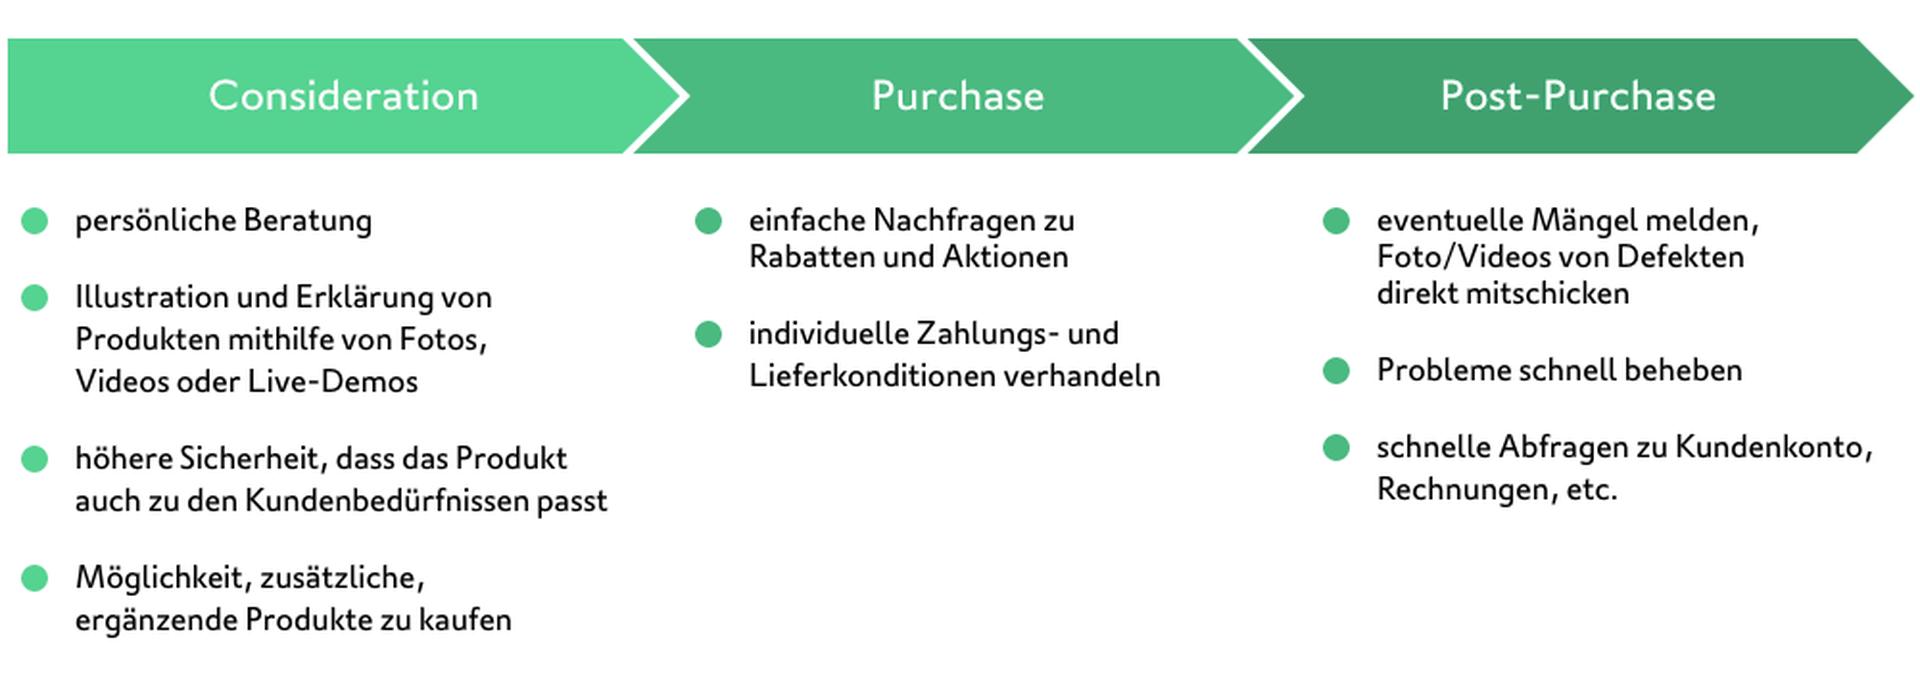 LINK Mobility - Customer Journey im Conversational Commerce